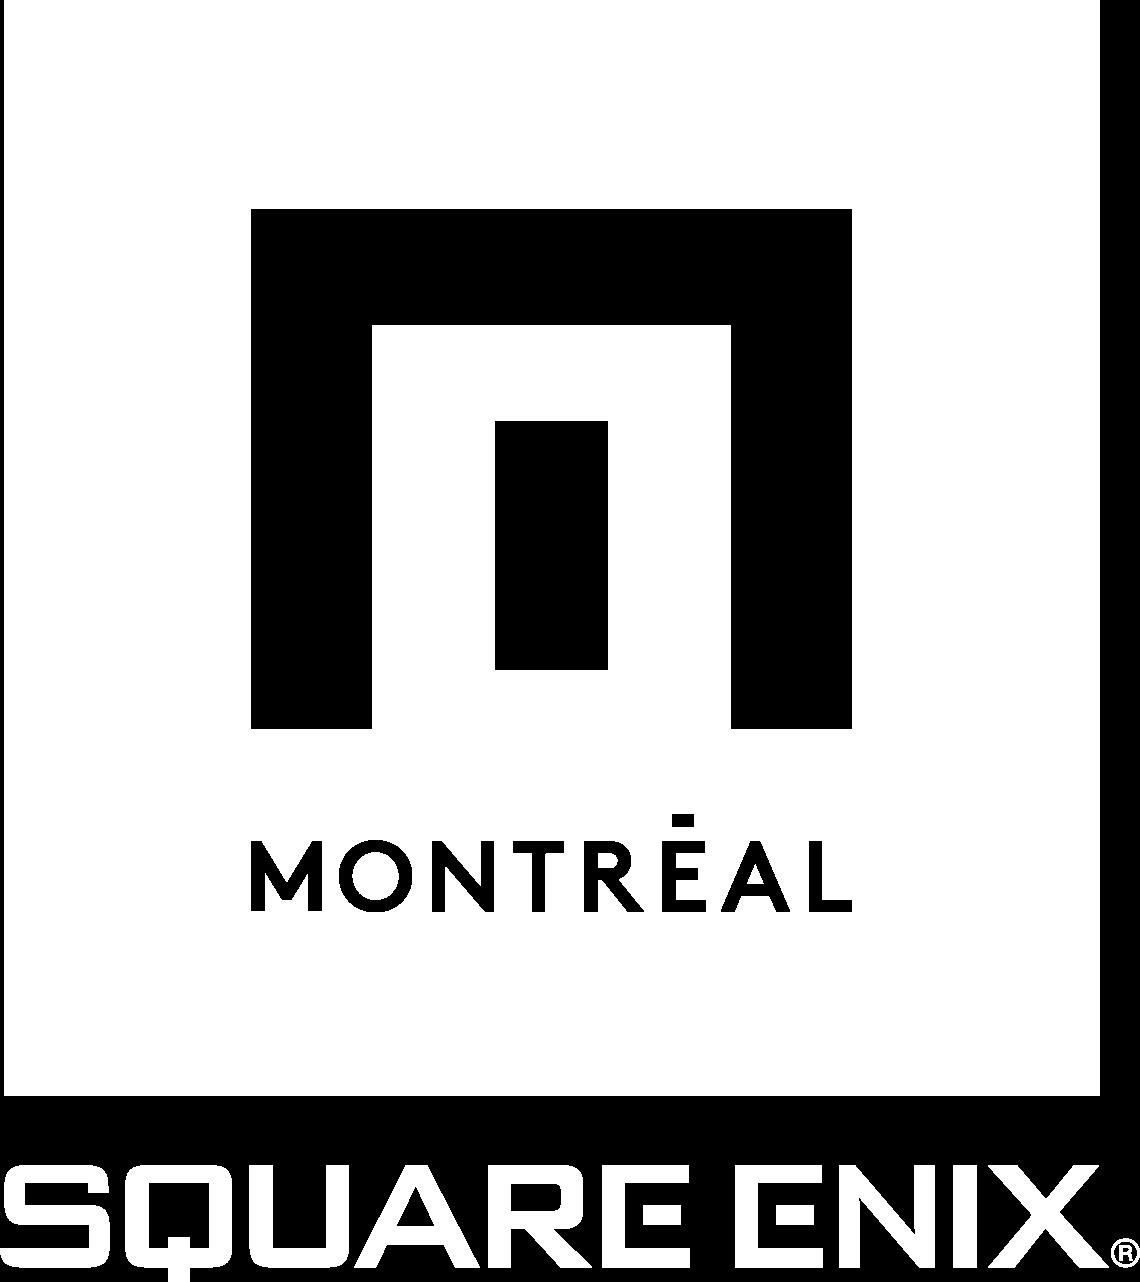 marketer-SquareEnix-white-logo.png